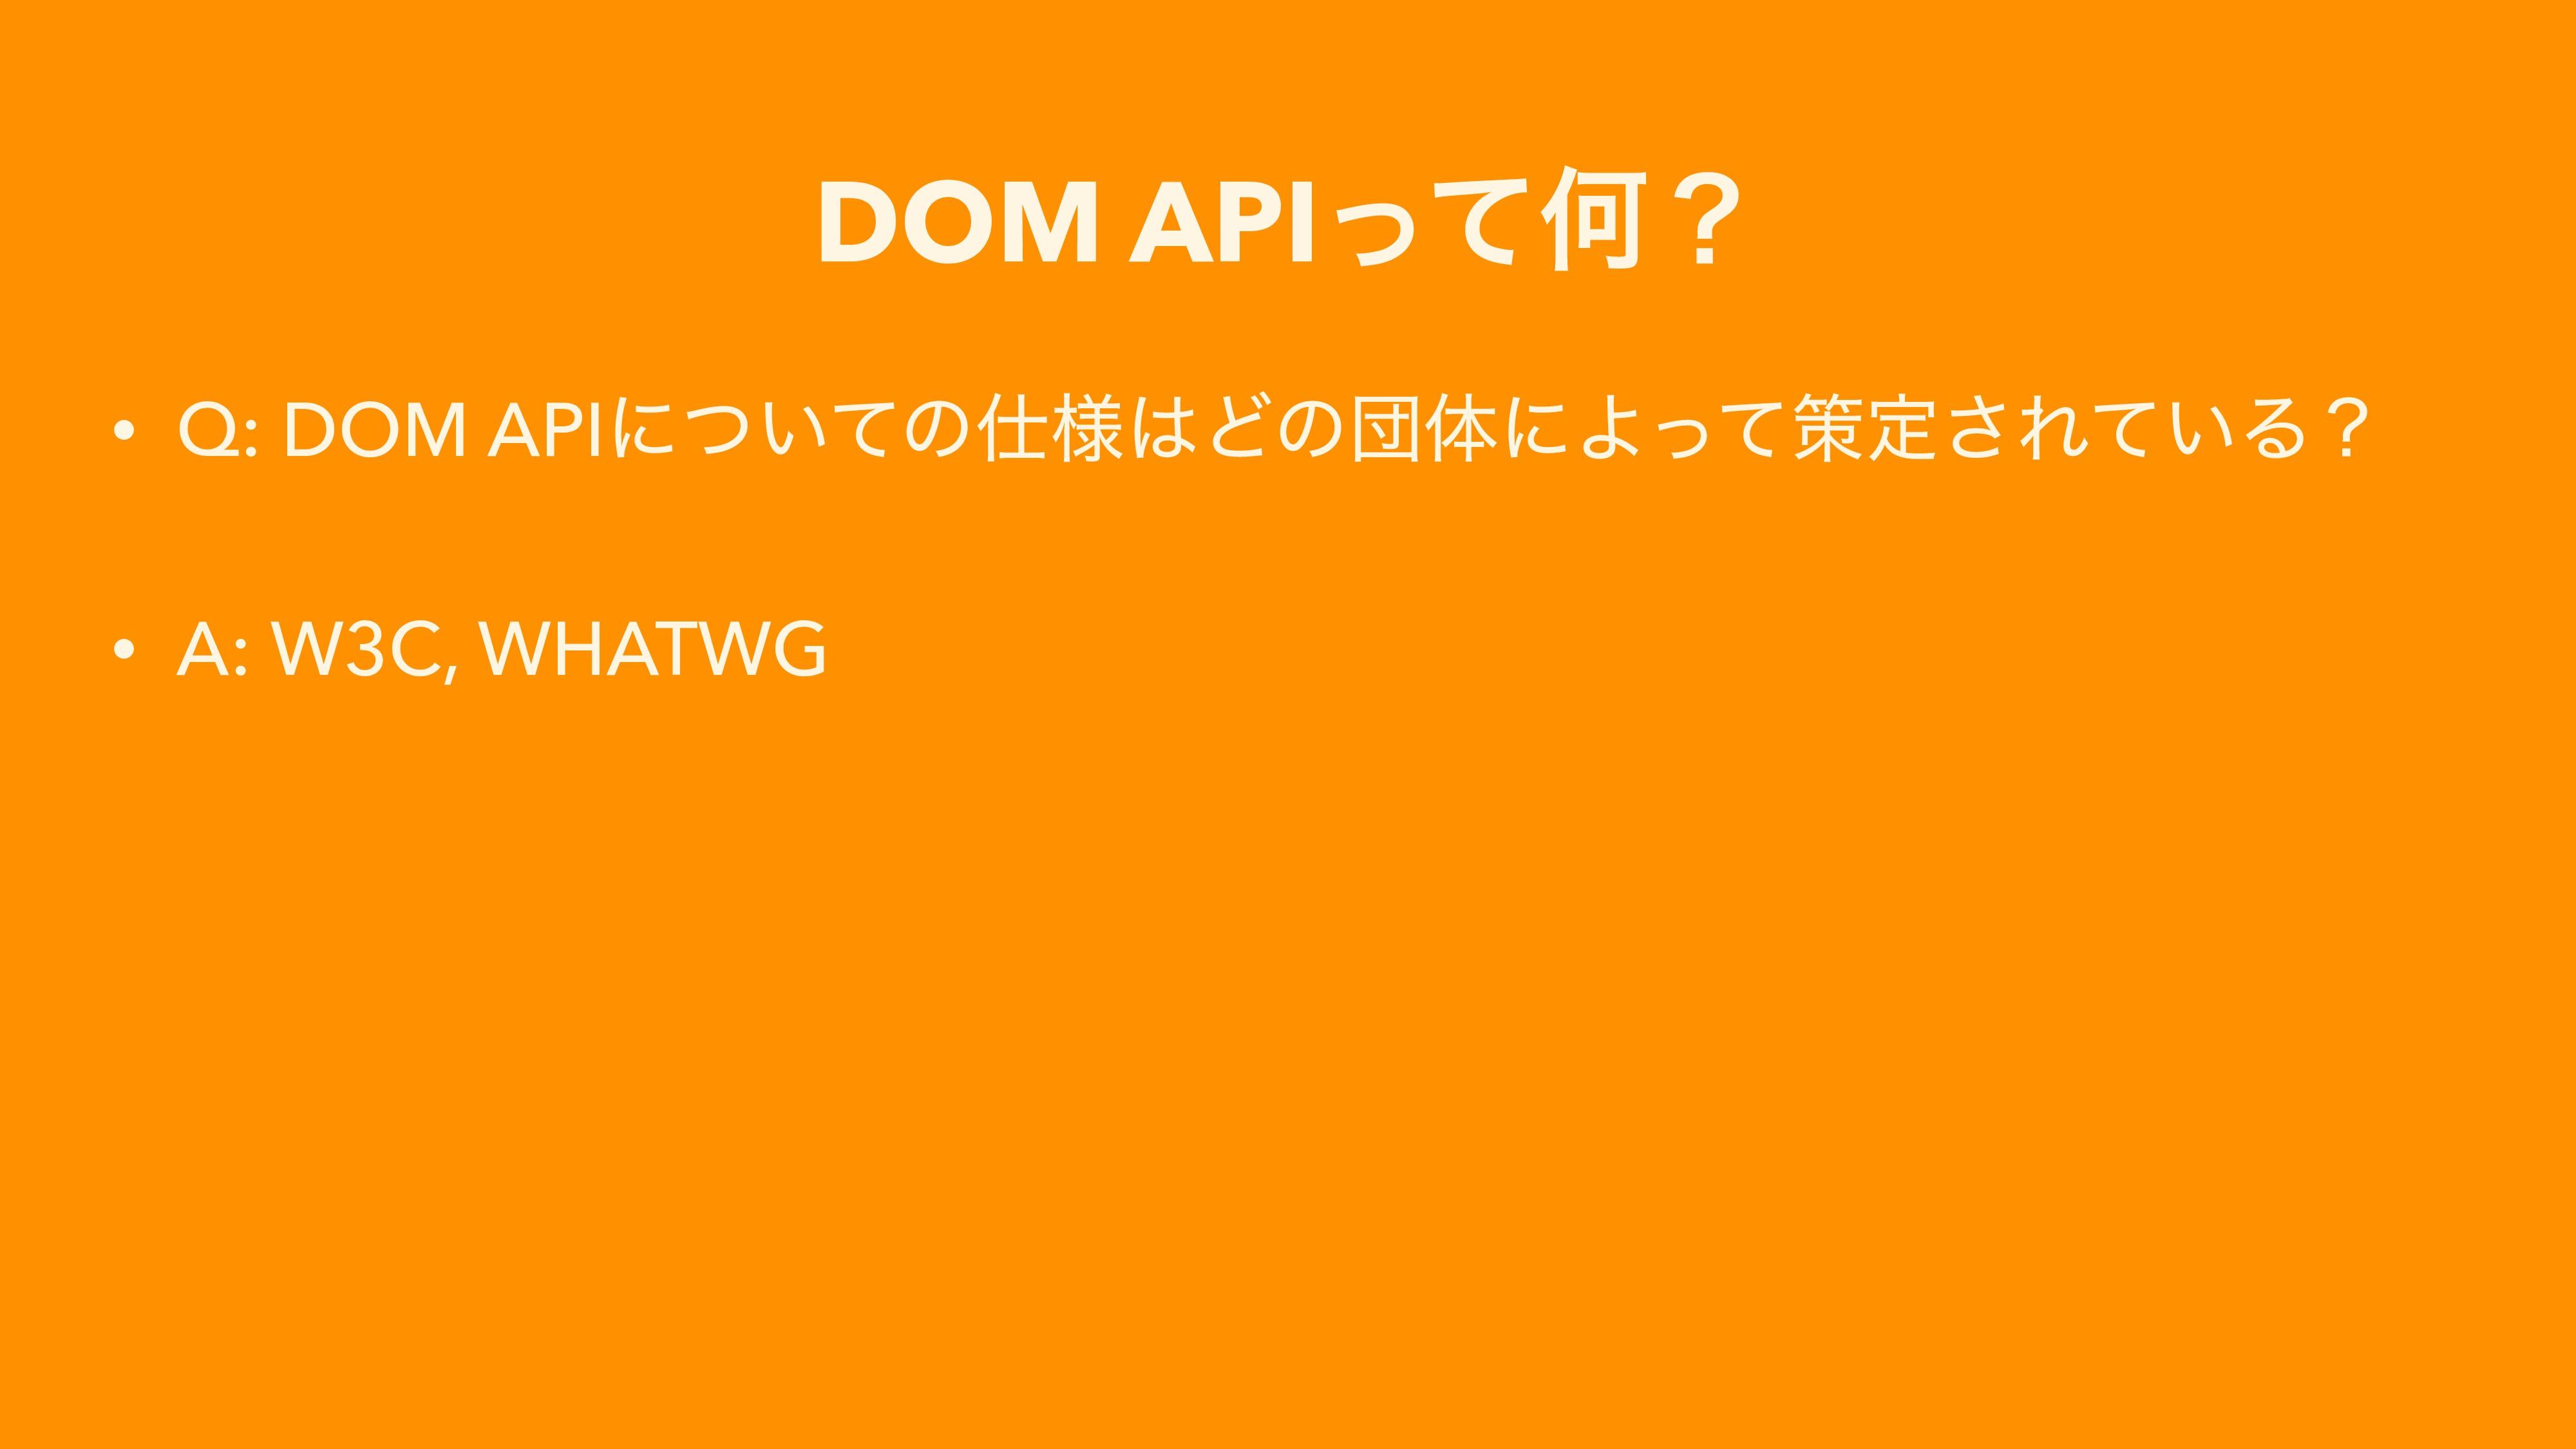 DOM APIͬͯԿʁ • Q: DOM APIʹ͍ͭͯͷ༷ͲͷஂମʹΑͬͯࡦఆ͞Ε͍ͯΔ...